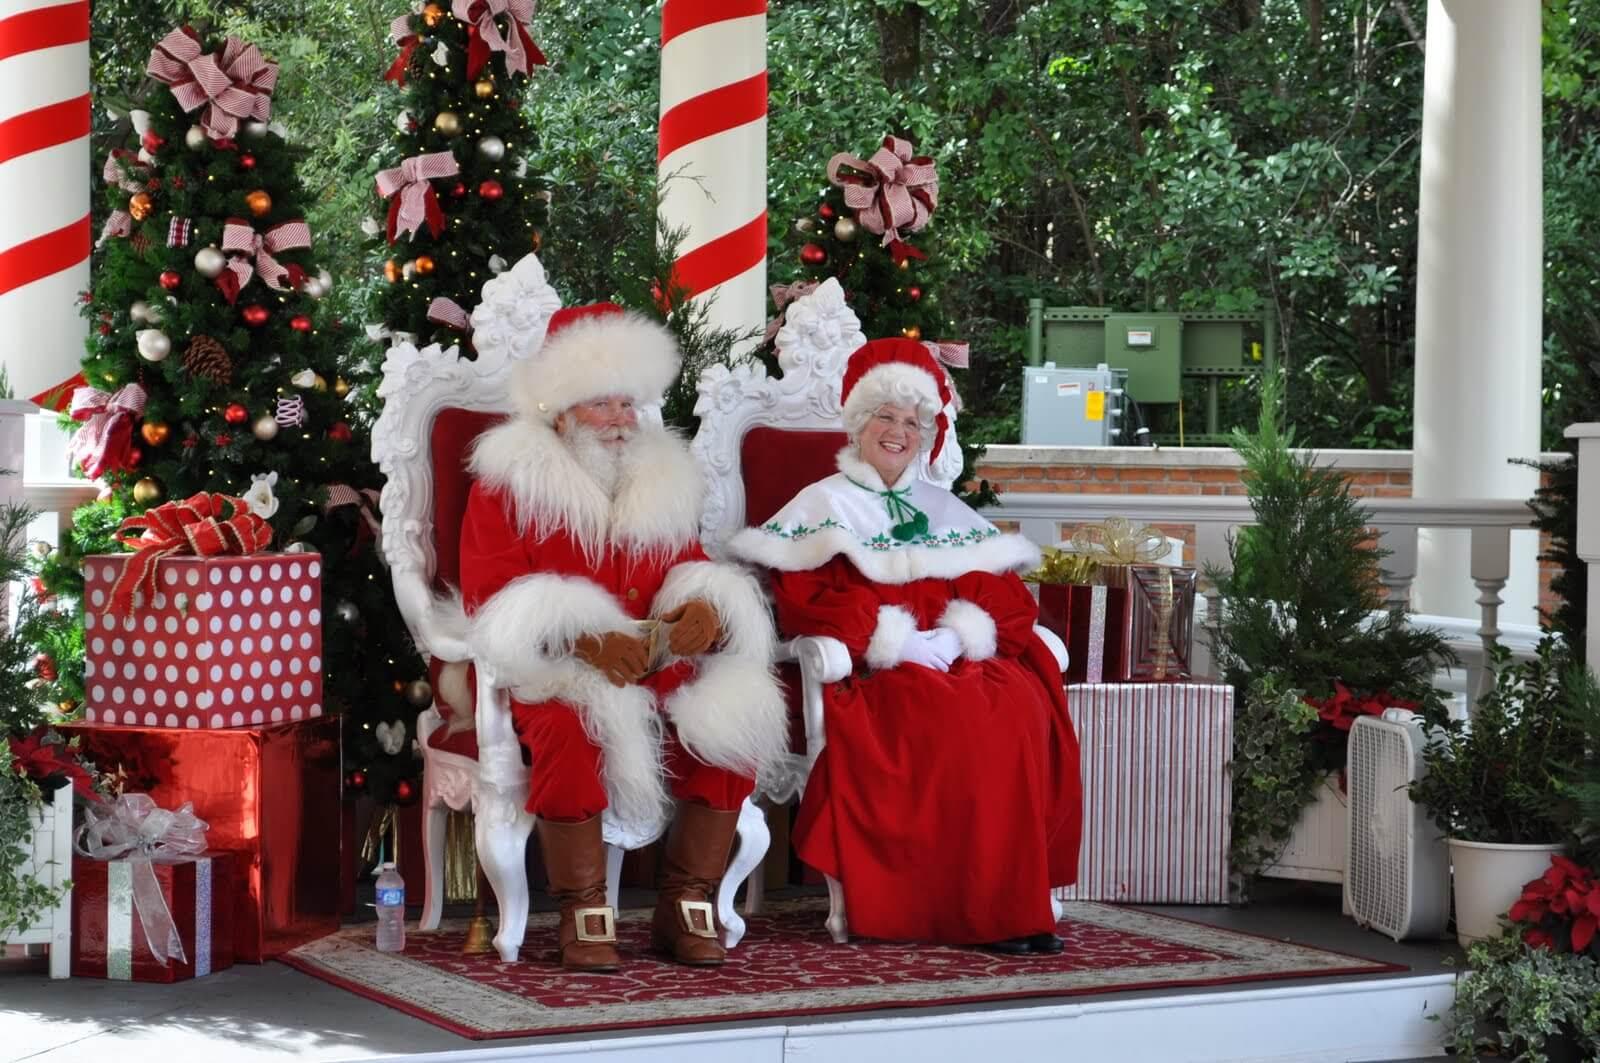 Onde encontrar o Papai Noel na Disney Orlando: Papai Noel e Mamãe Noel no Disney Epcot